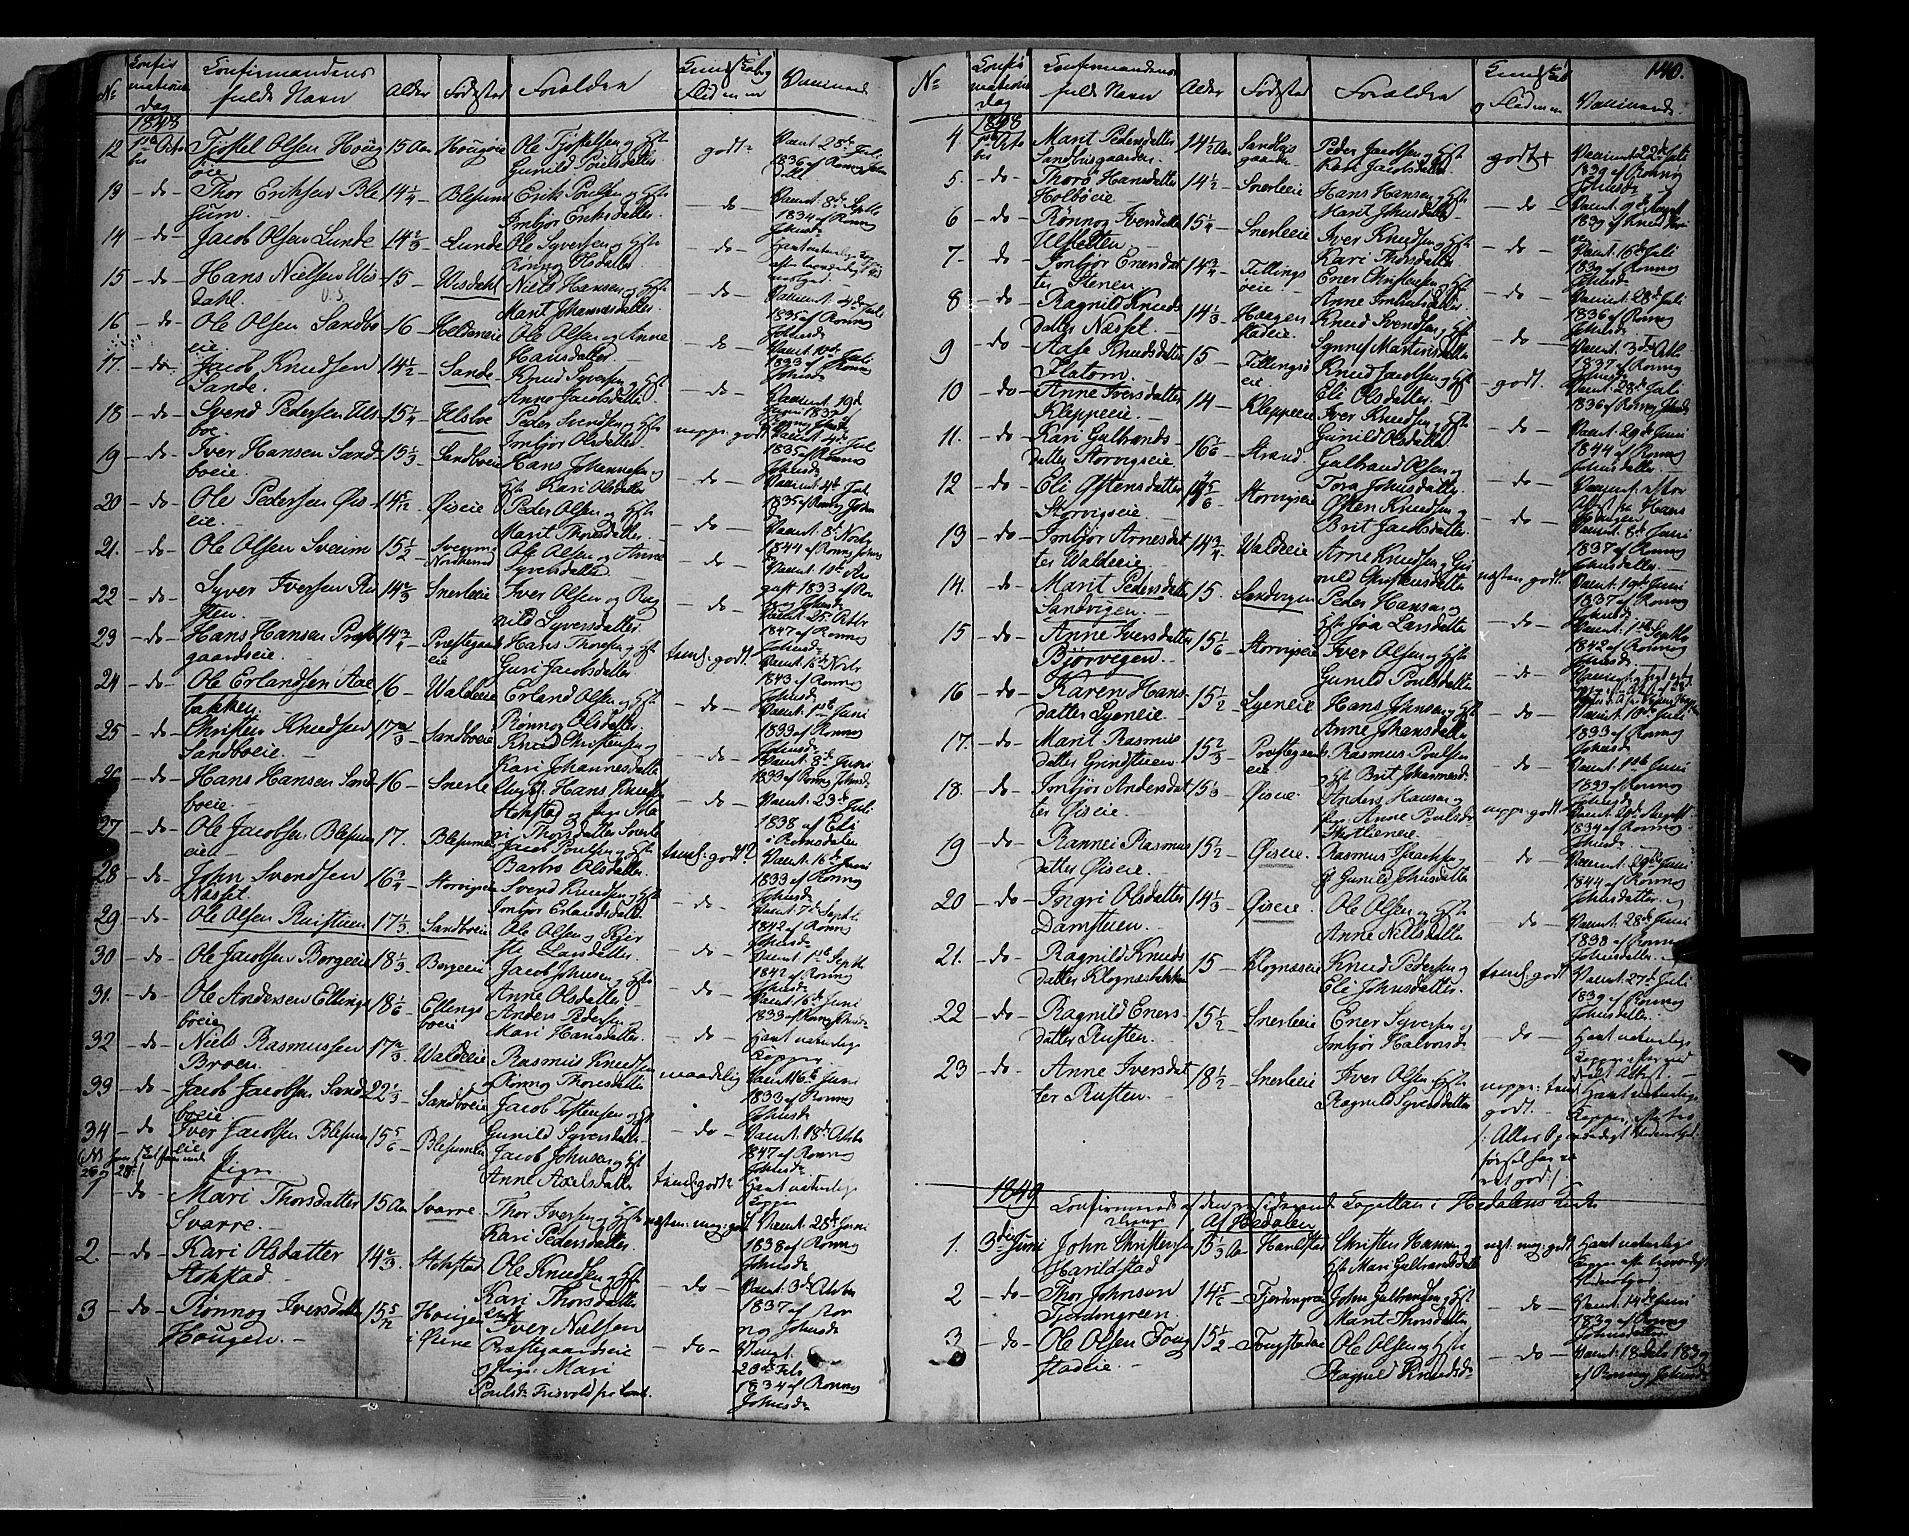 SAH, Vågå prestekontor, Ministerialbok nr. 5 /1, 1842-1856, s. 140